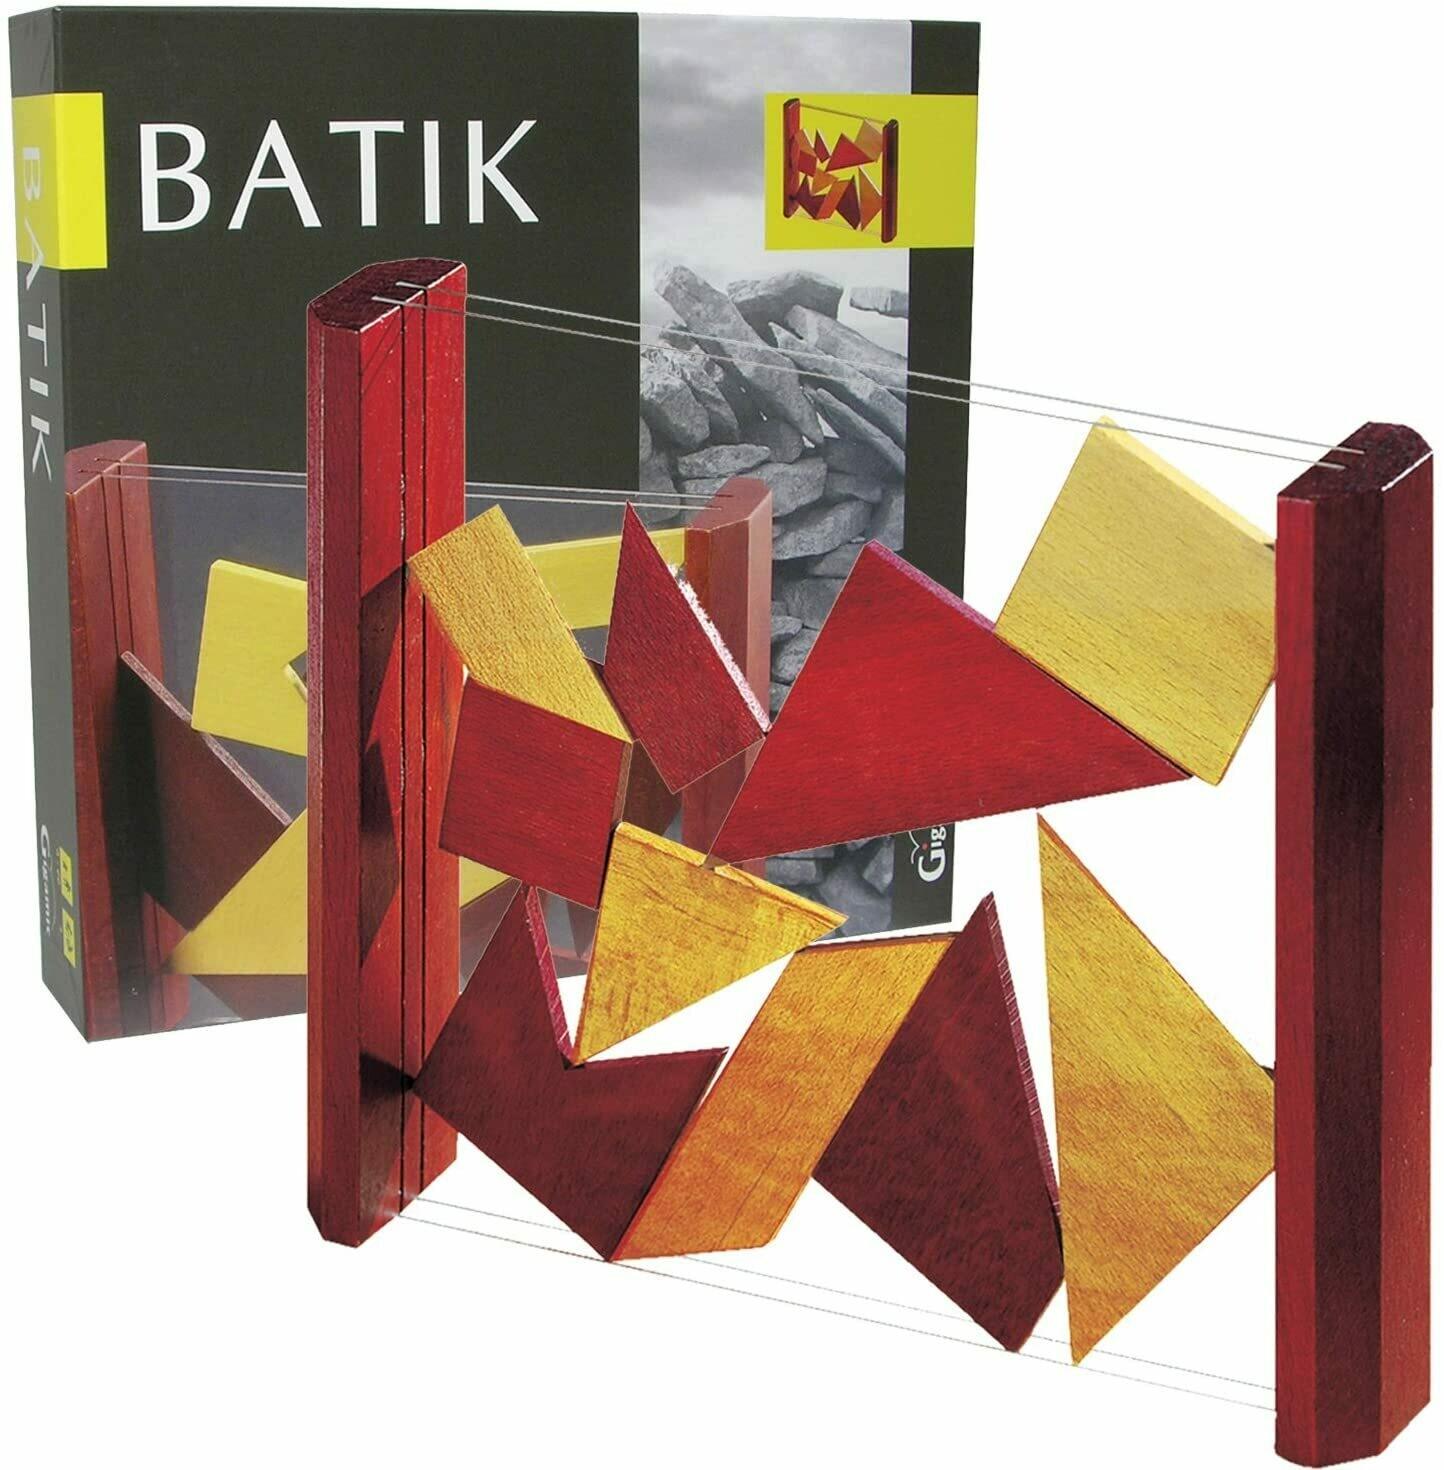 Batik - Danneggiato